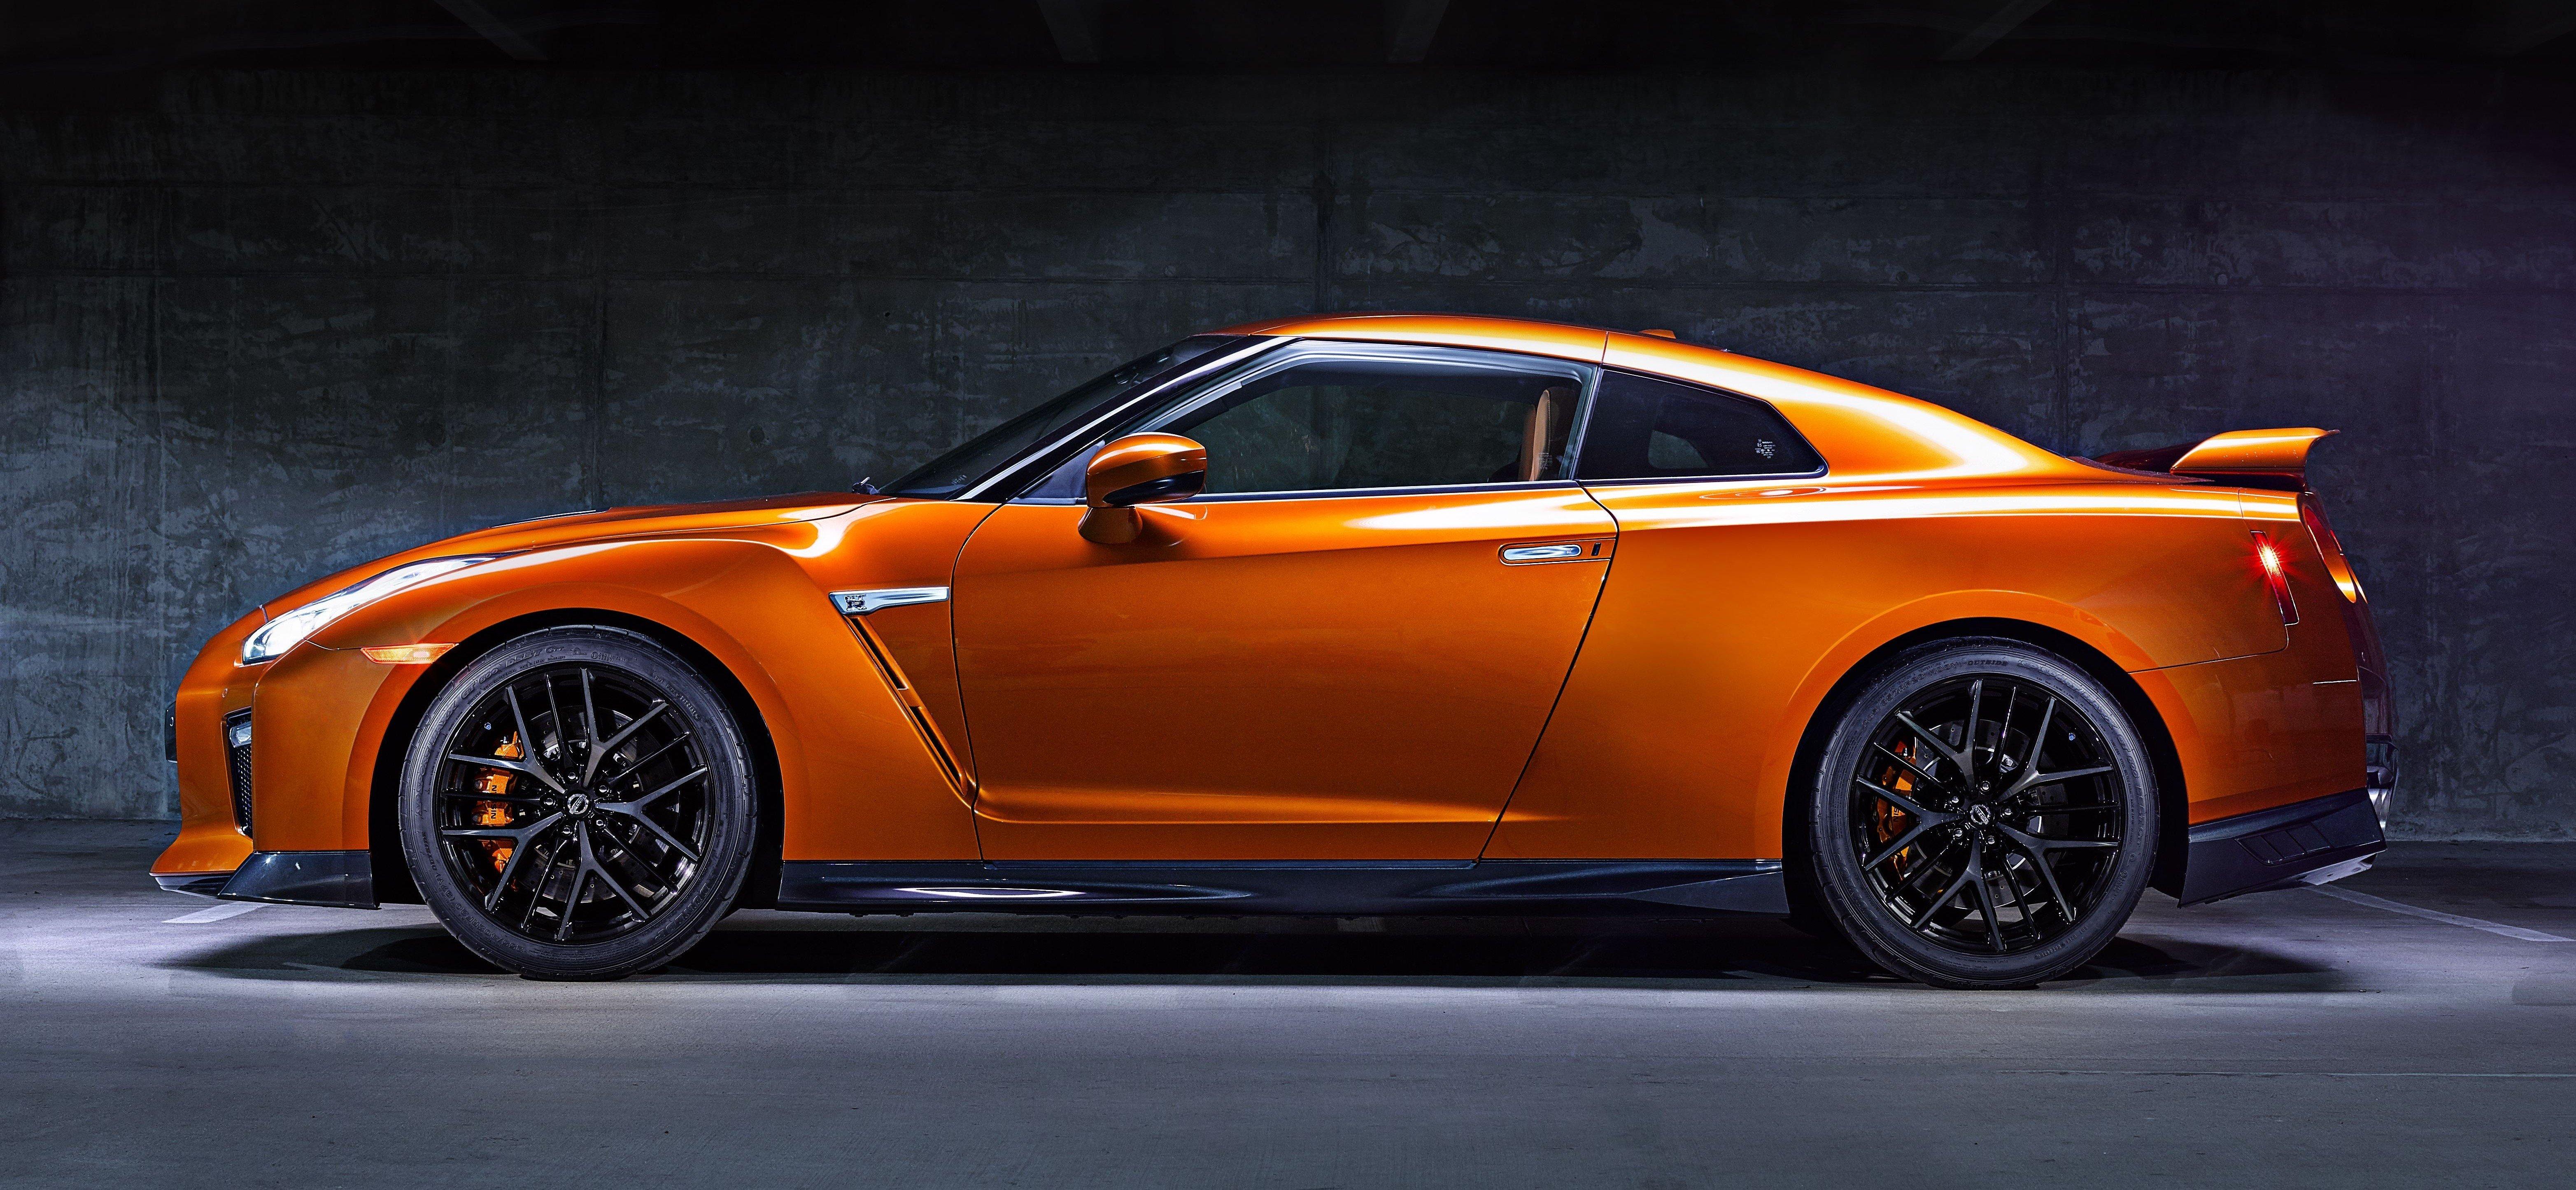 Nissan 2018 >> 2017 Nissan GT-R shown – more premium, more power Paul Tan - Image 465800